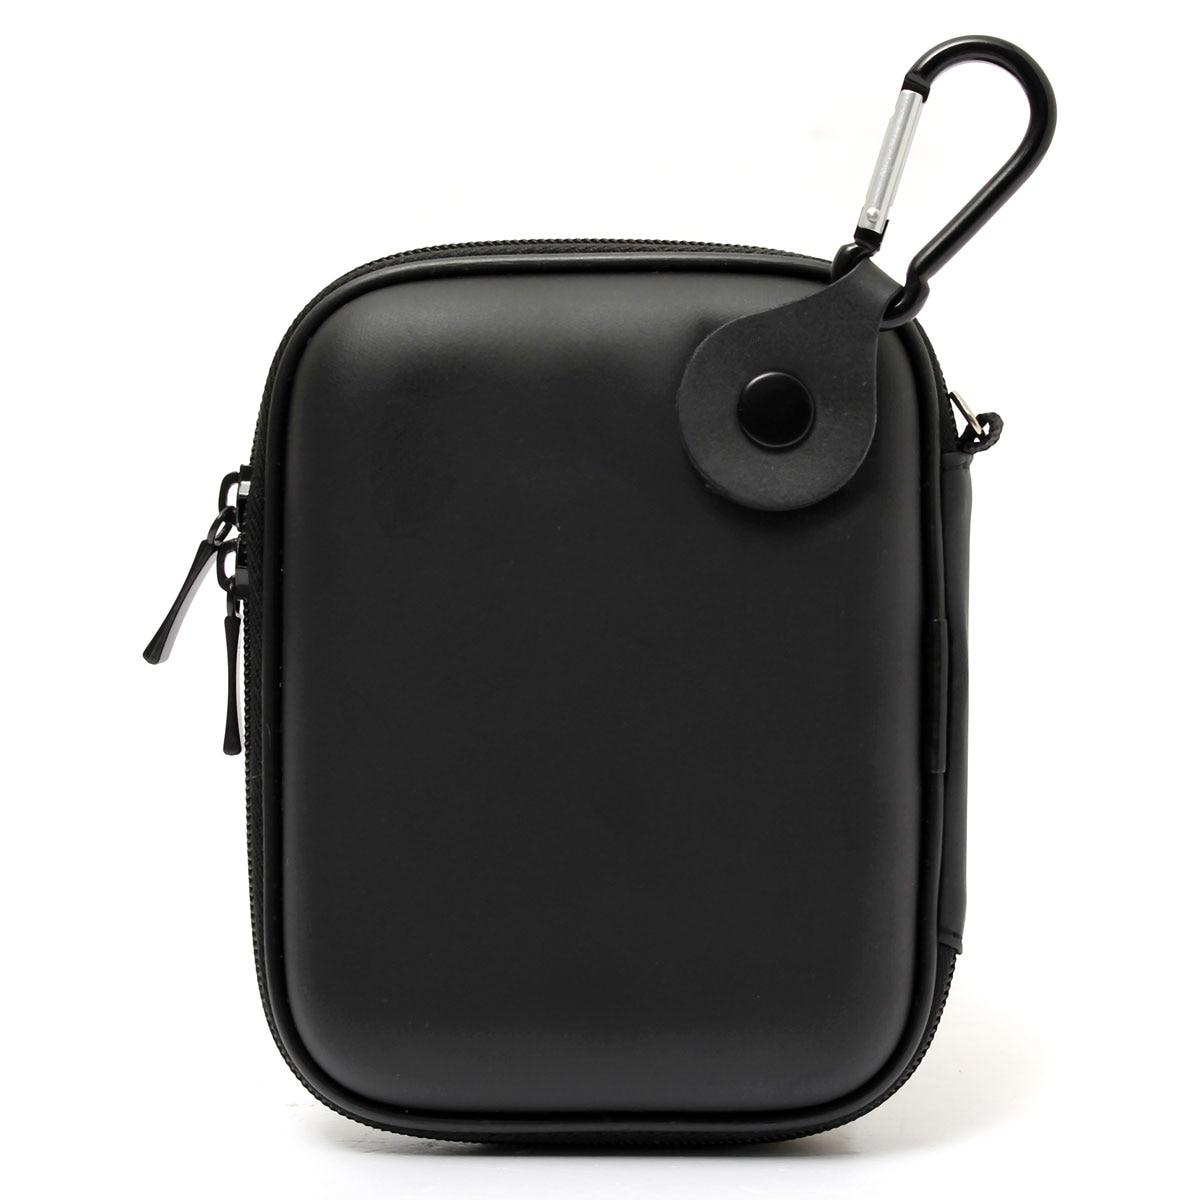 Bolsa de transporte rígida externa con cremallera universal de 5,5 portátil, bolsa de protección para la expansión de Seagate, disco duro externo